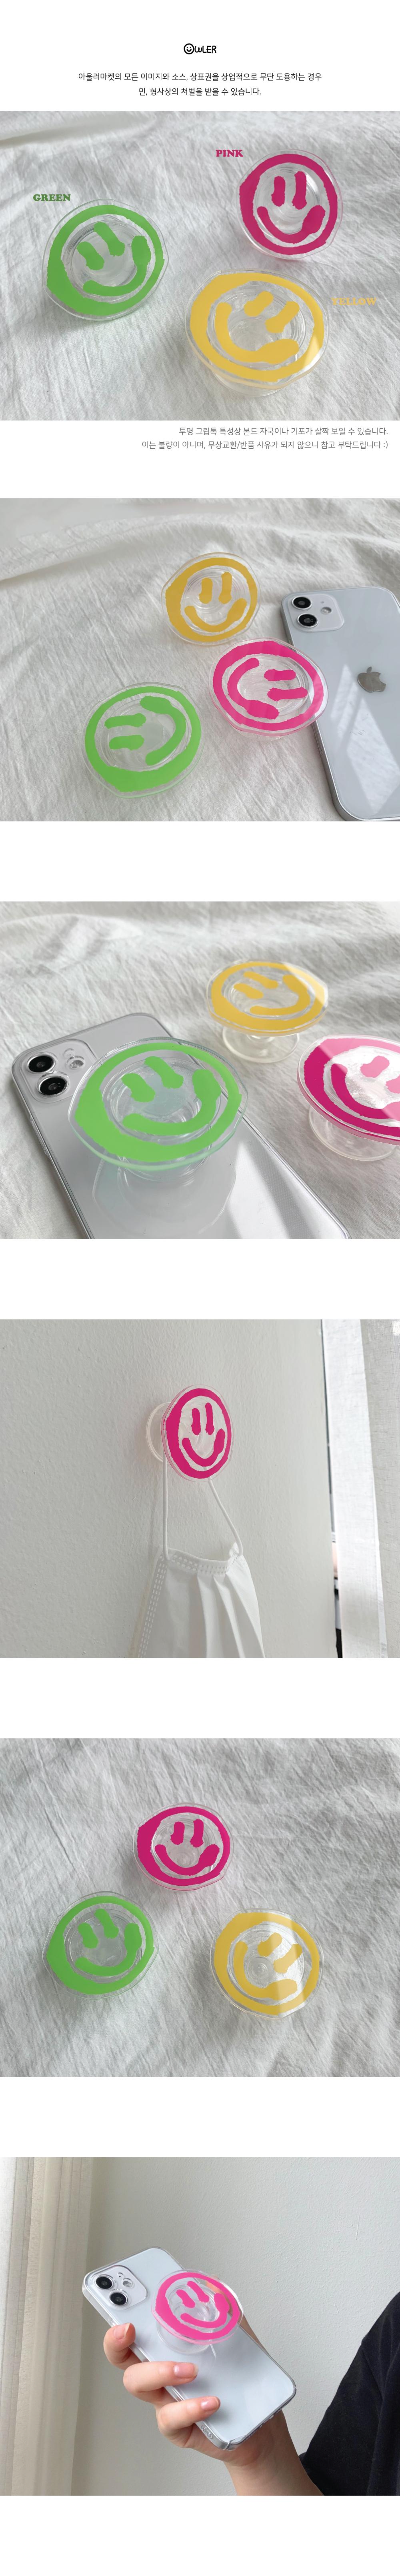 Graffiti Smile Transparent Acrylic Grip Tok